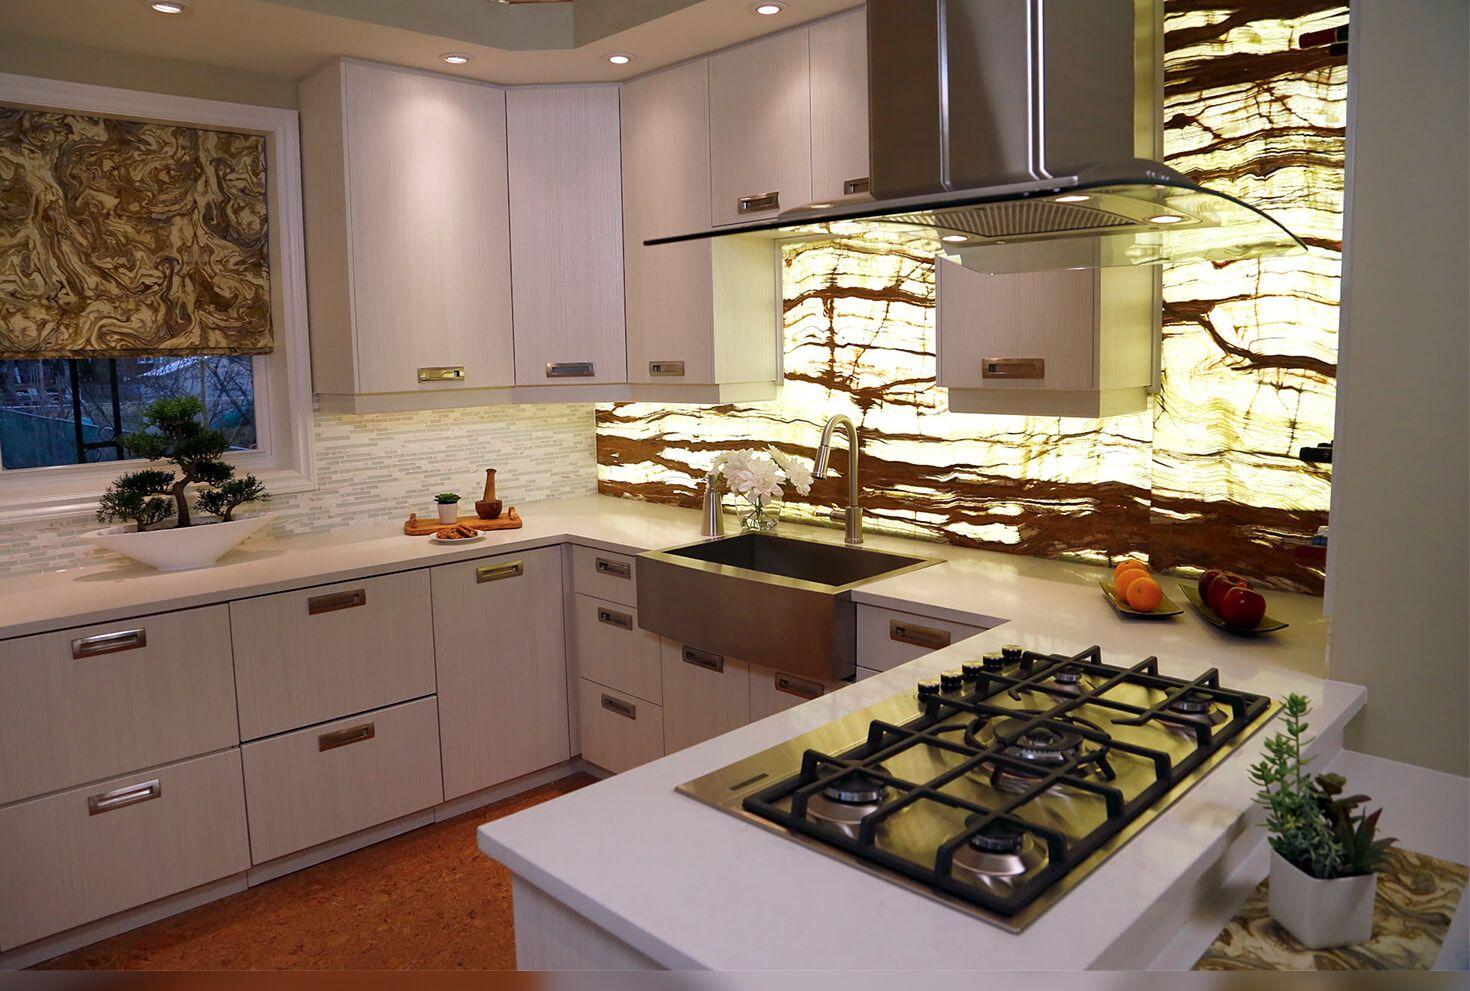 Account Suspended Kitchen Design Kitchen Table Settings Modern Kitchen Design